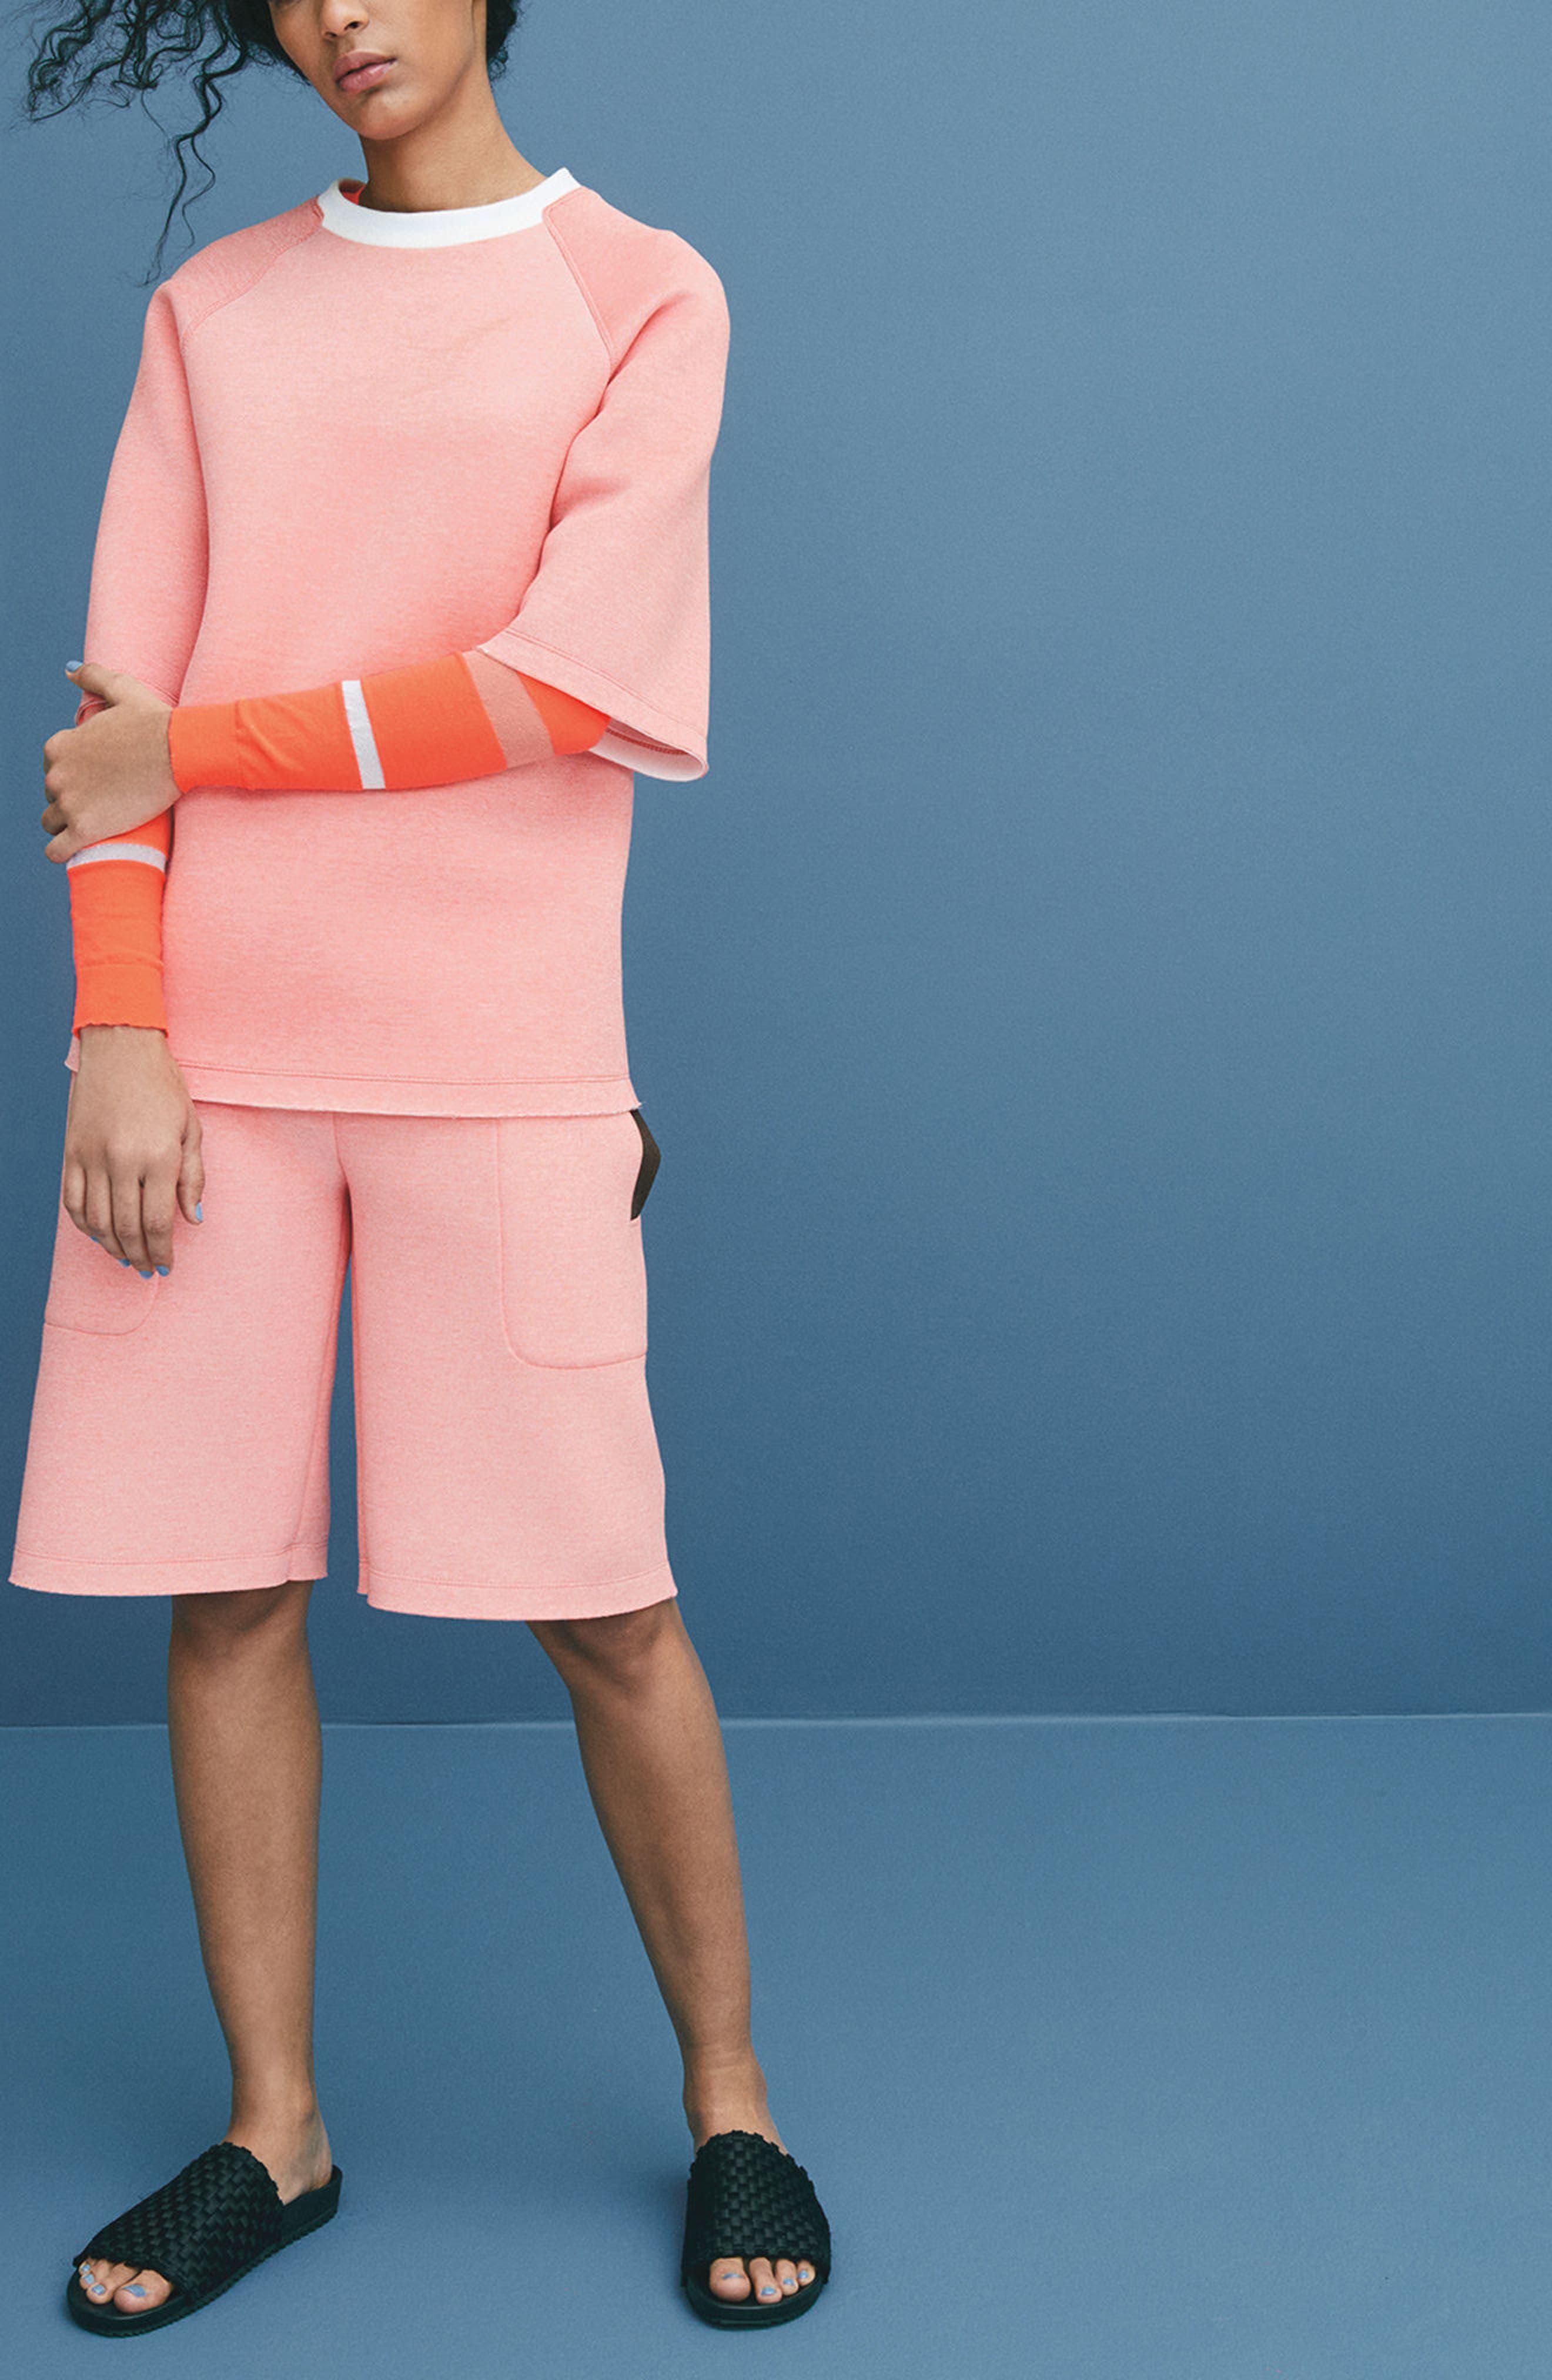 Tech Shorts,                             Alternate thumbnail 2, color,                             Coral